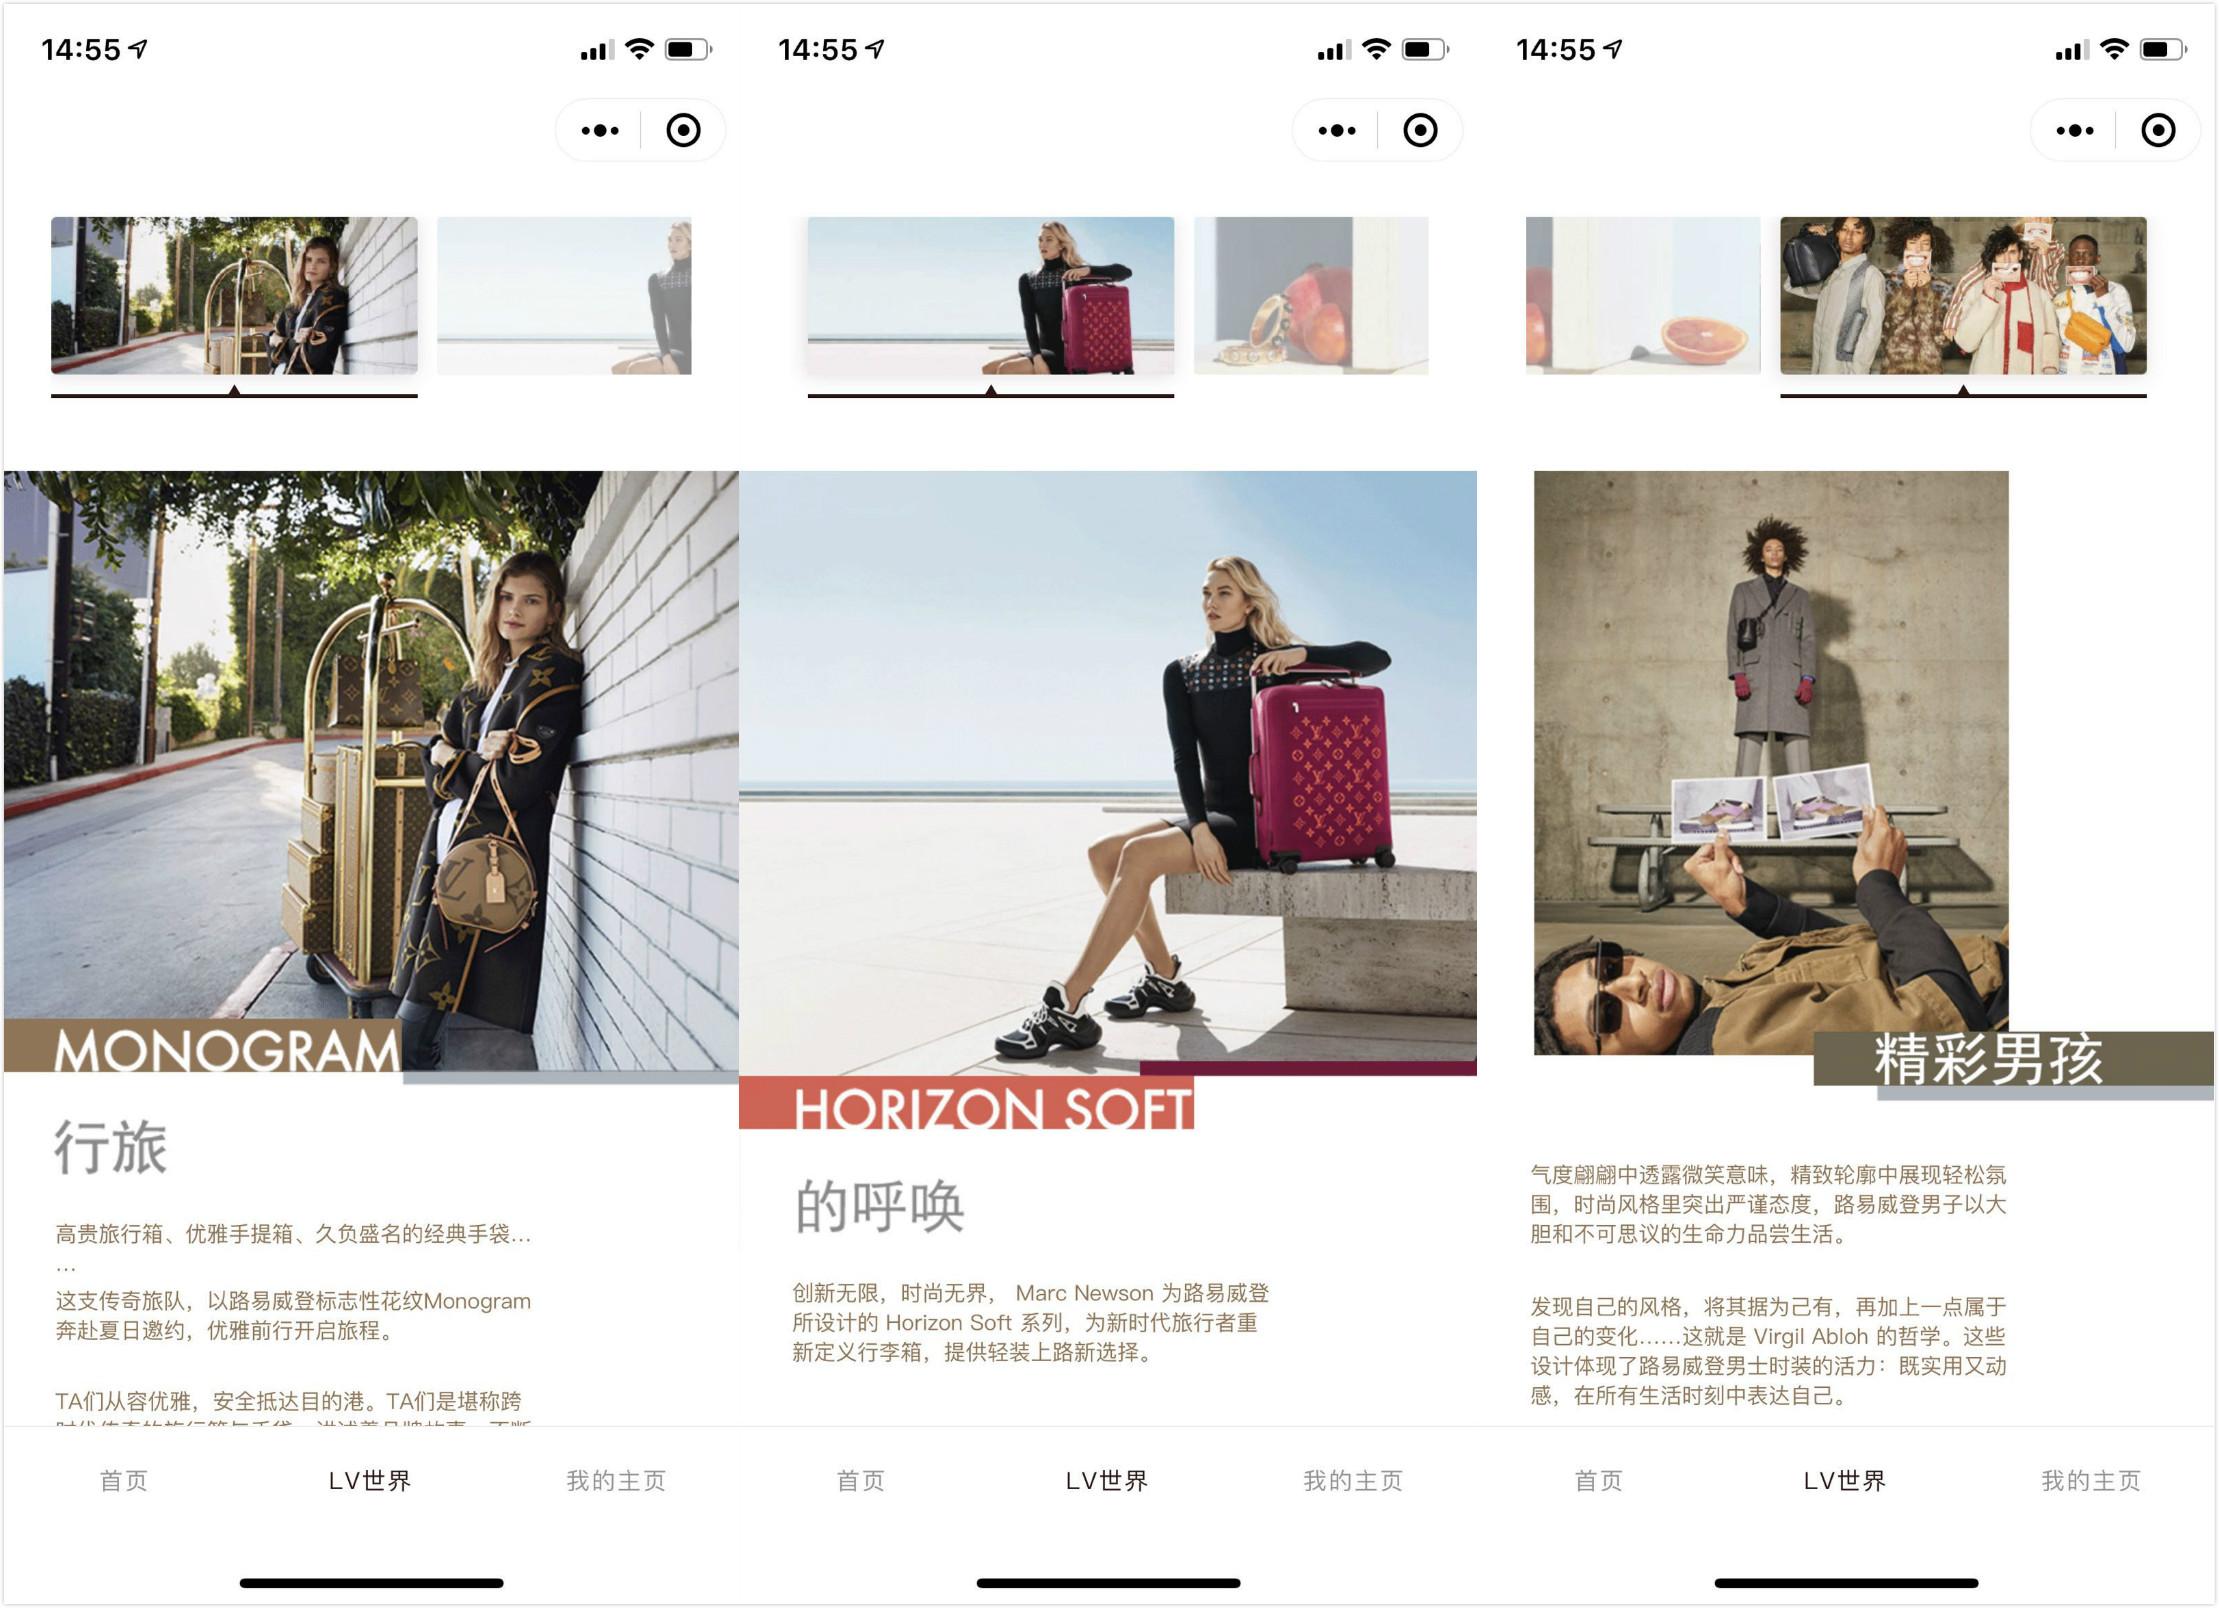 Screenshot of Louis Vuitton's newly launched educational WeChat Mini-program